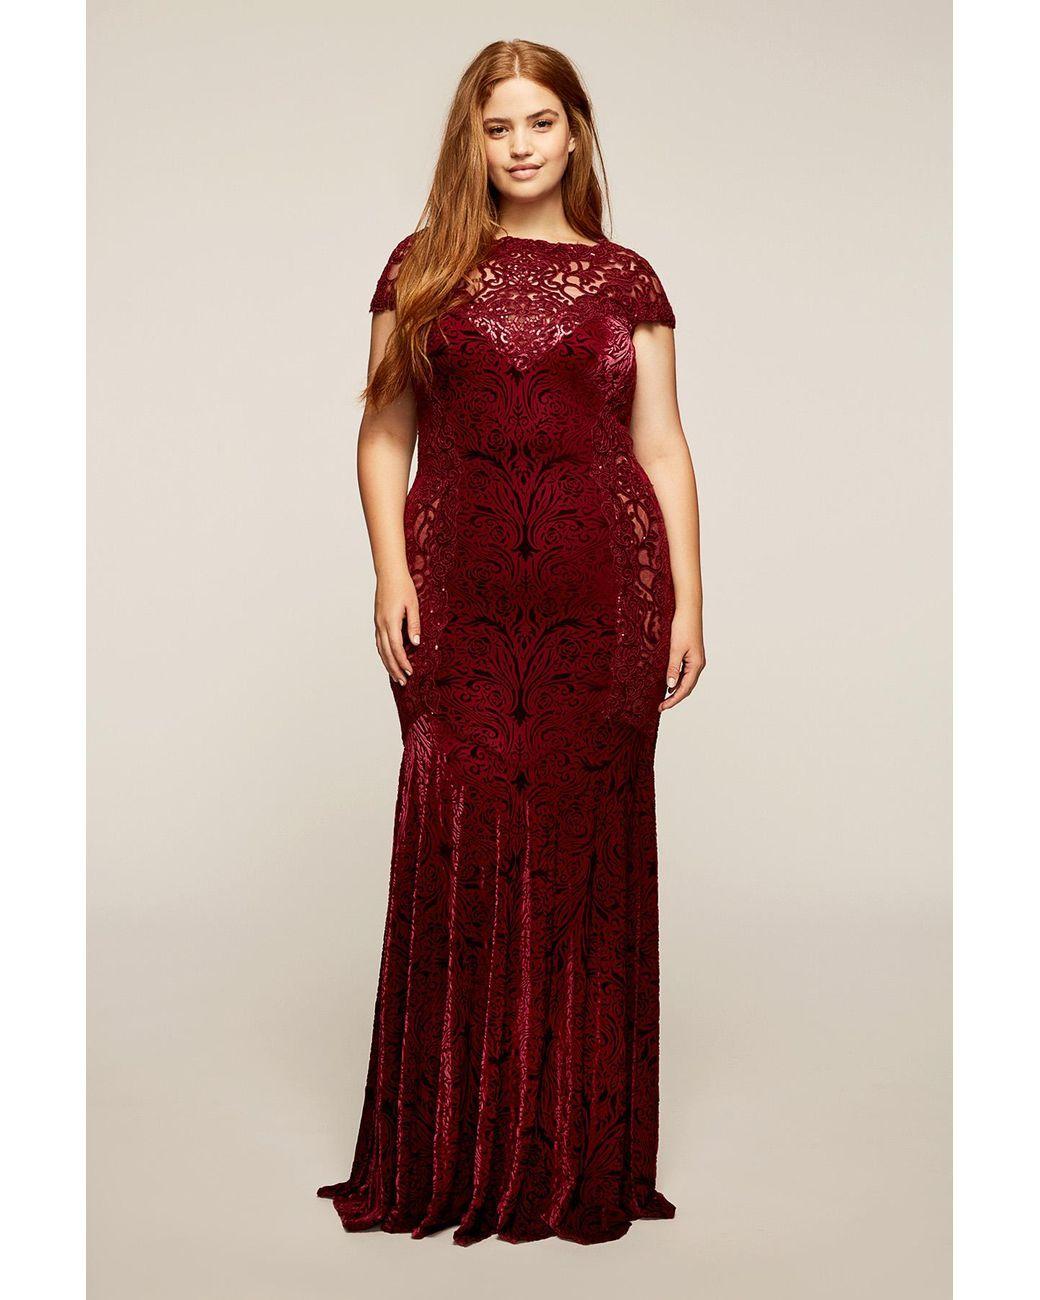 Womenus red muriel gown plus size tadashi temple pinterest